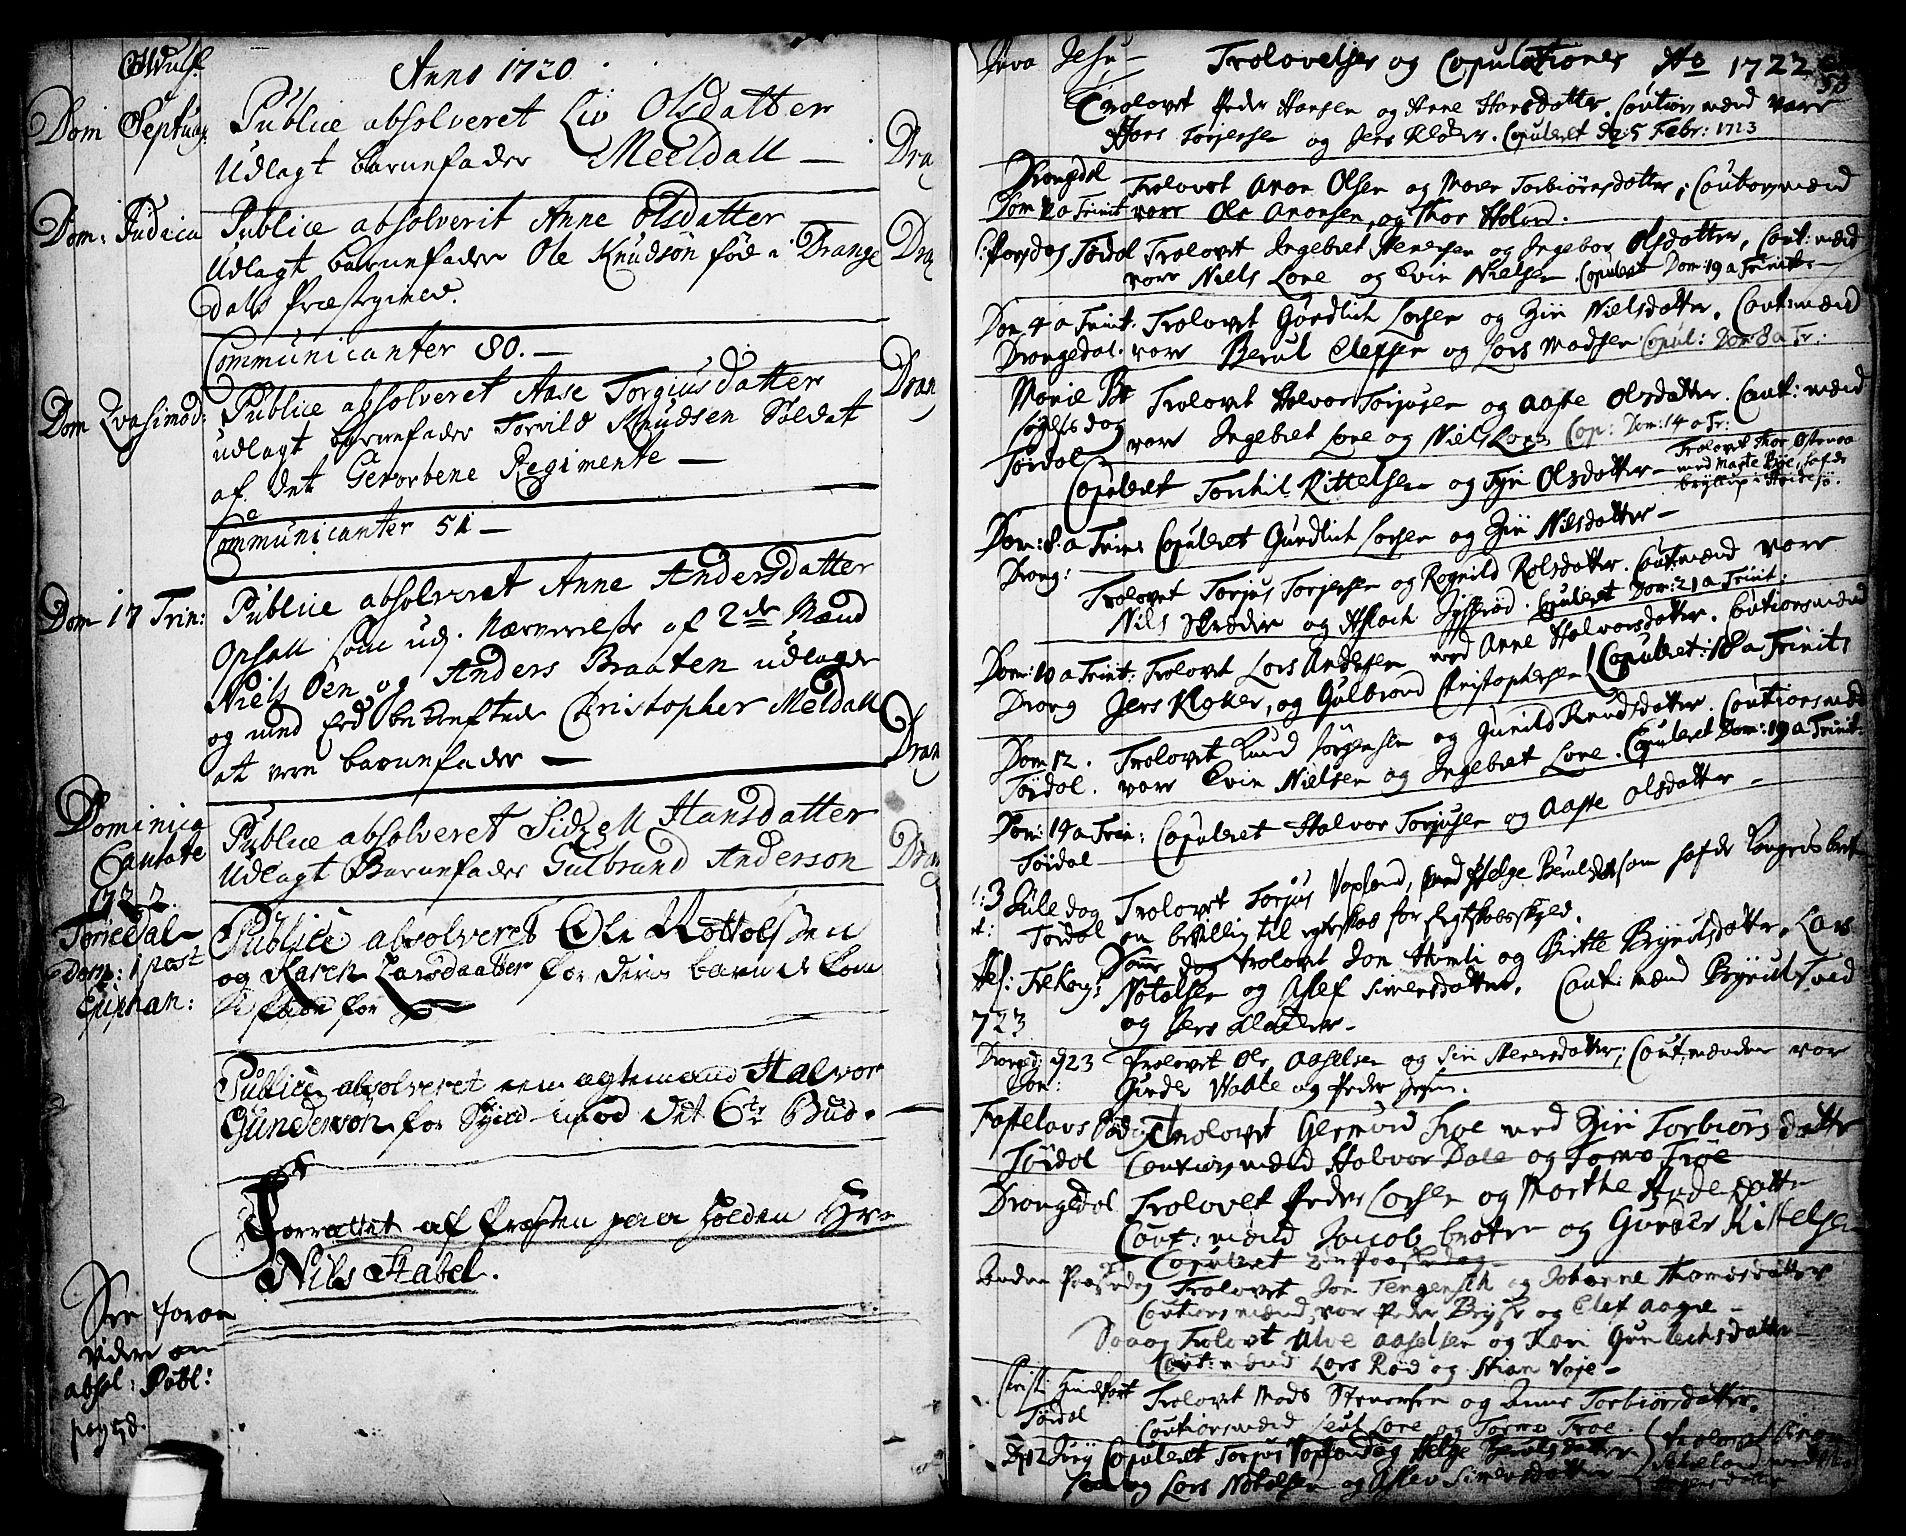 SAKO, Drangedal kirkebøker, F/Fa/L0001: Ministerialbok nr. 1, 1697-1767, s. 53